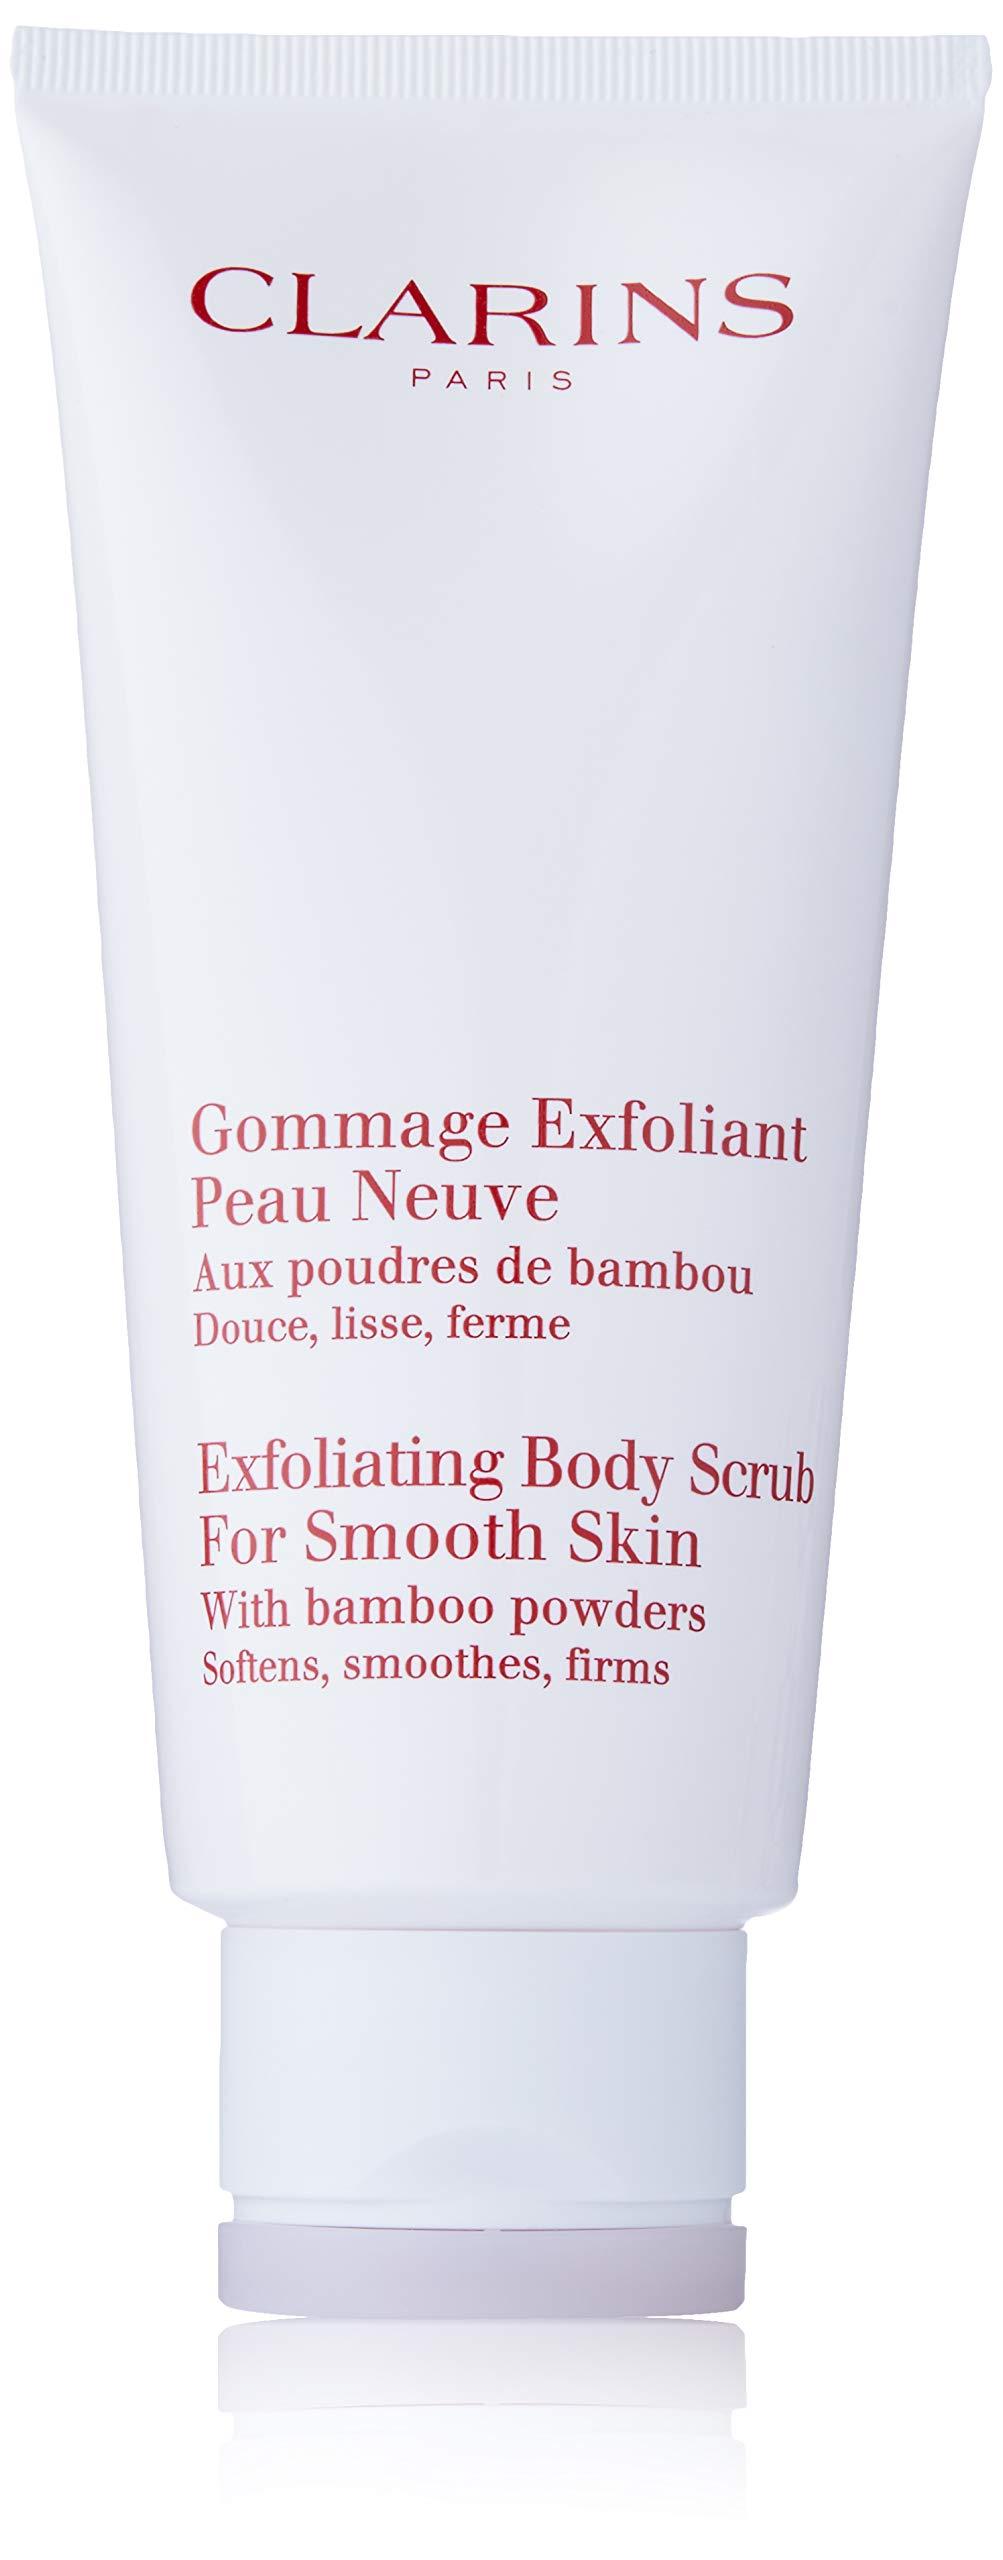 CLARINS Exfoliating Body Scrub for Smooth Skin, 6.9 Ounce